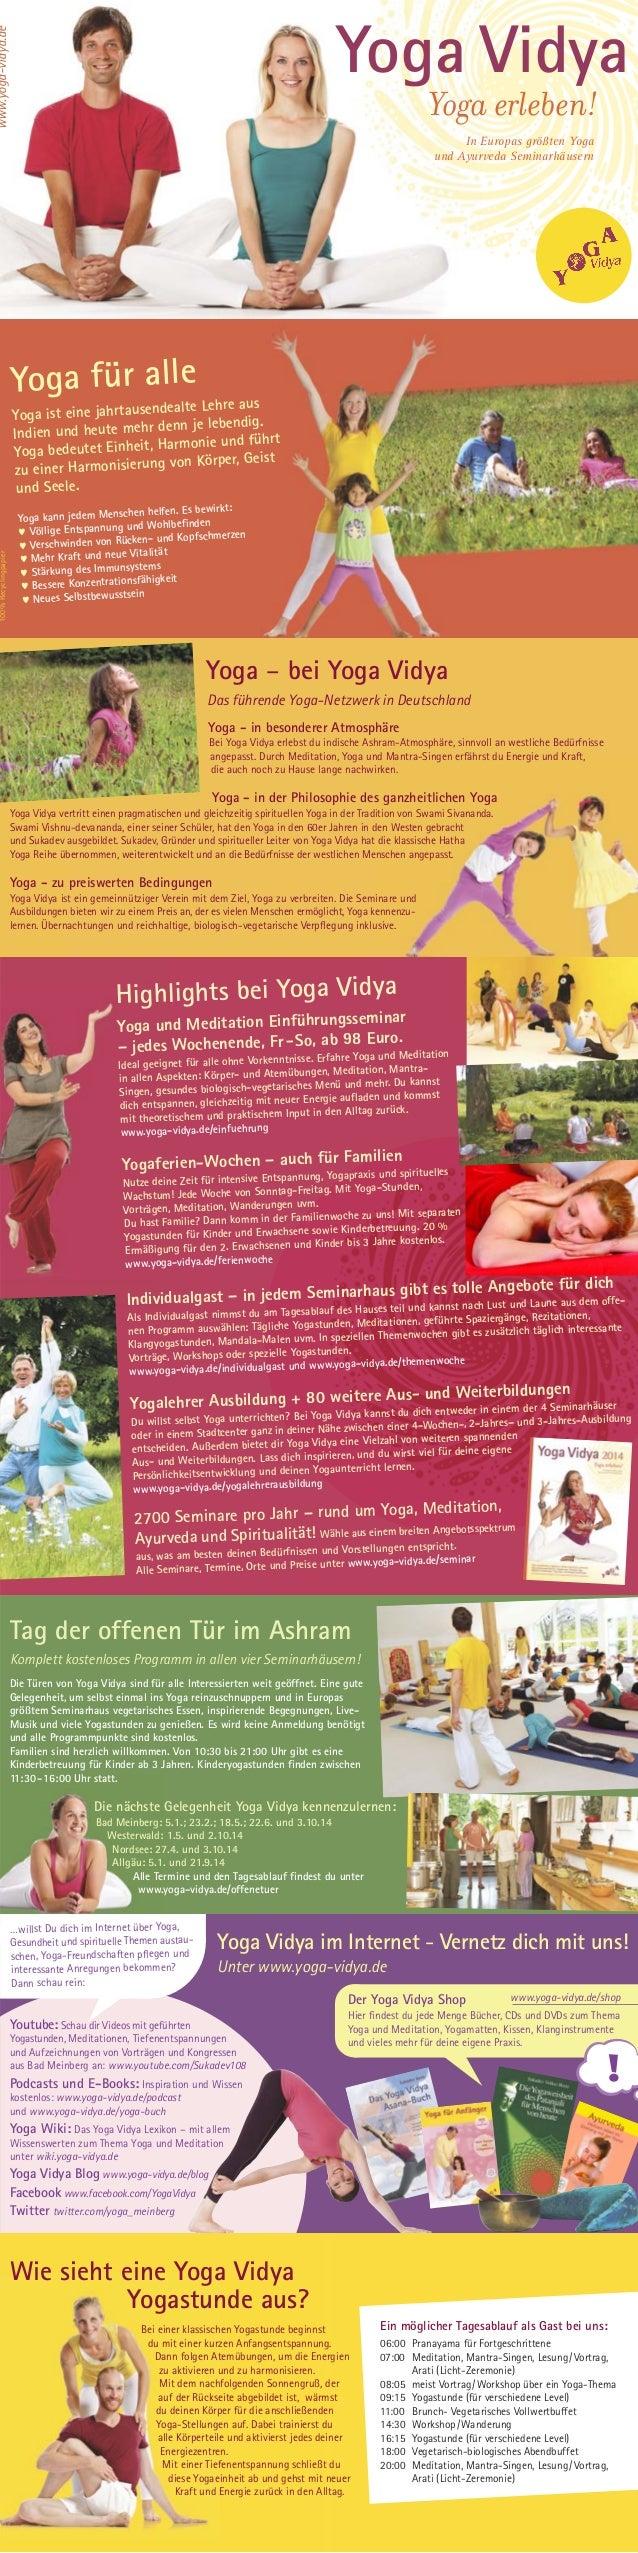 www.yoga-vidya.de  Yoga Vidya Yoga erleben! In Europas größten Yoga und Ayurveda Seminarhäusern  Yoga für alle  100 % Recy...